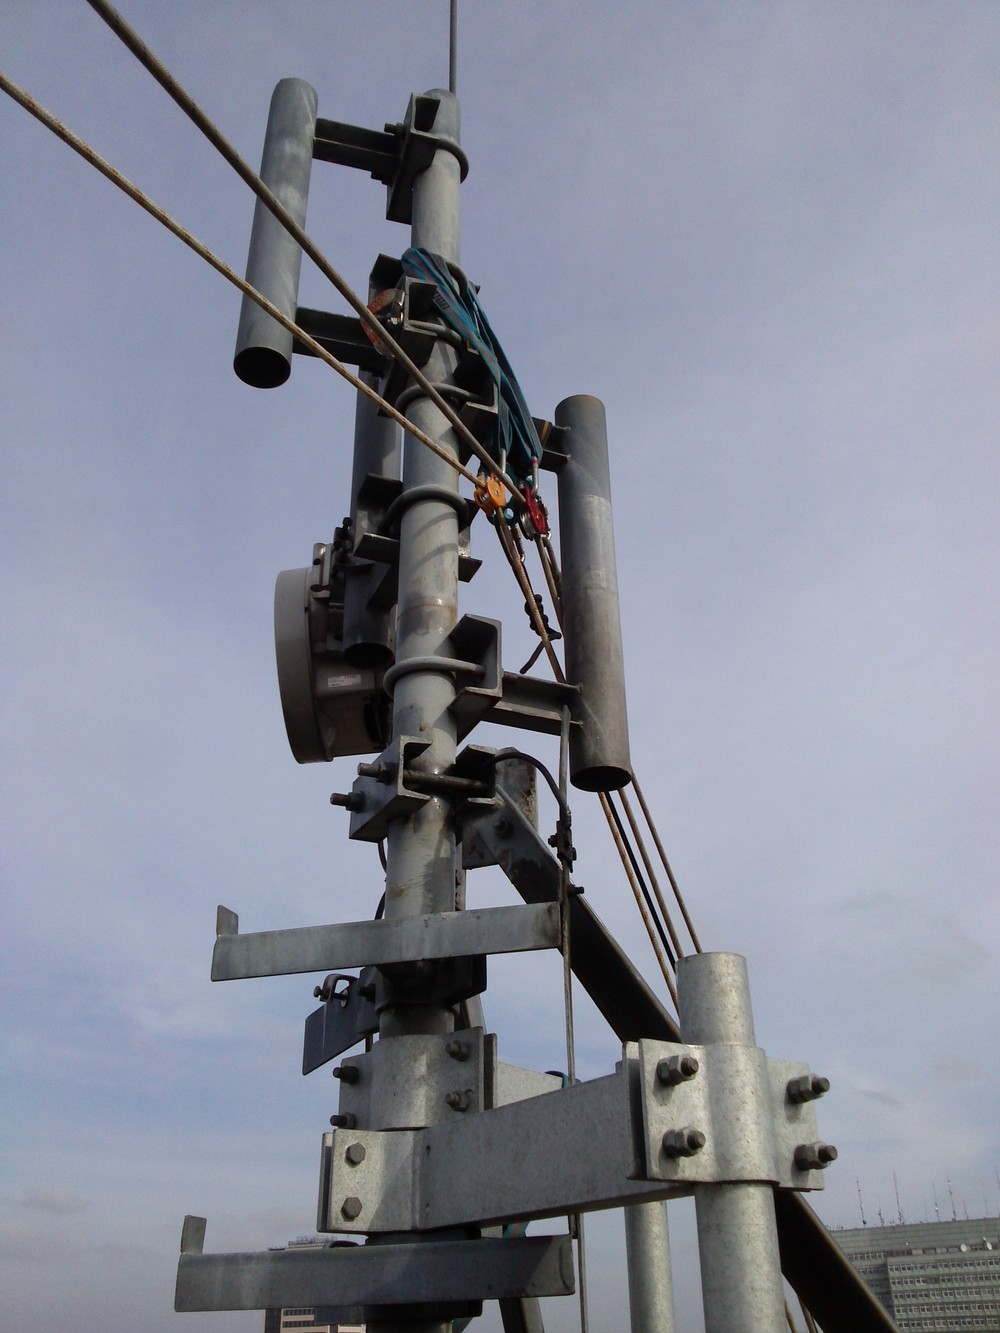 montaż anten telekomunikacyjnych Łódź